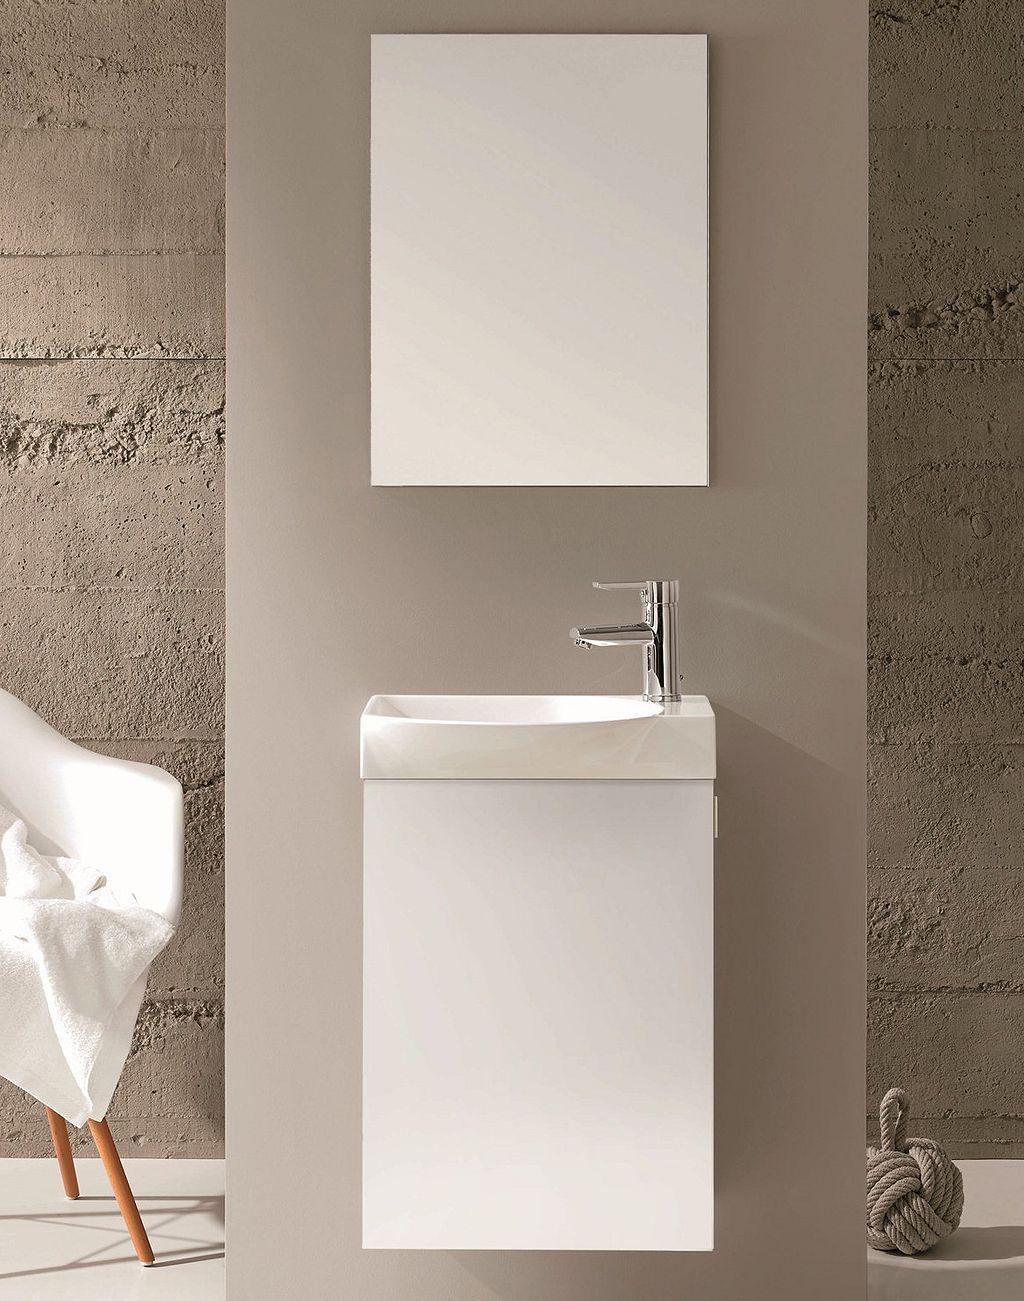 modern wall mounted vanity mirror setup ideas modern wall wall